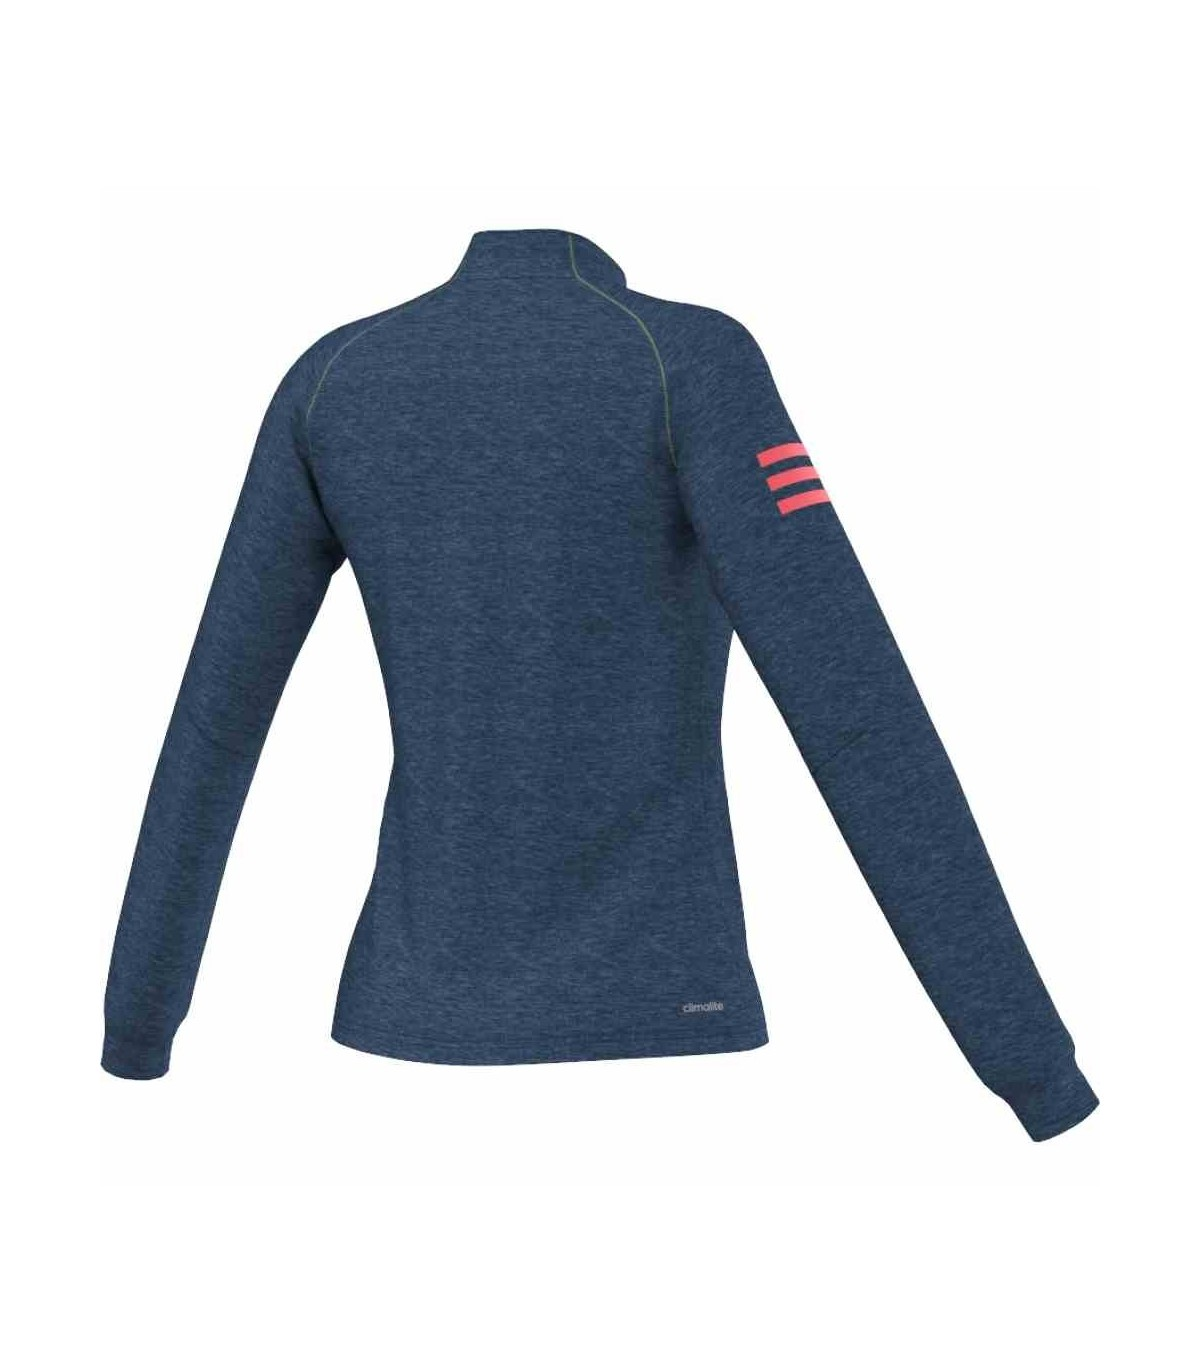 super popular ca71c ff6d8 Sweatshirt Adidas Club Zip Midlayer pour Femmes  My-Squash.c